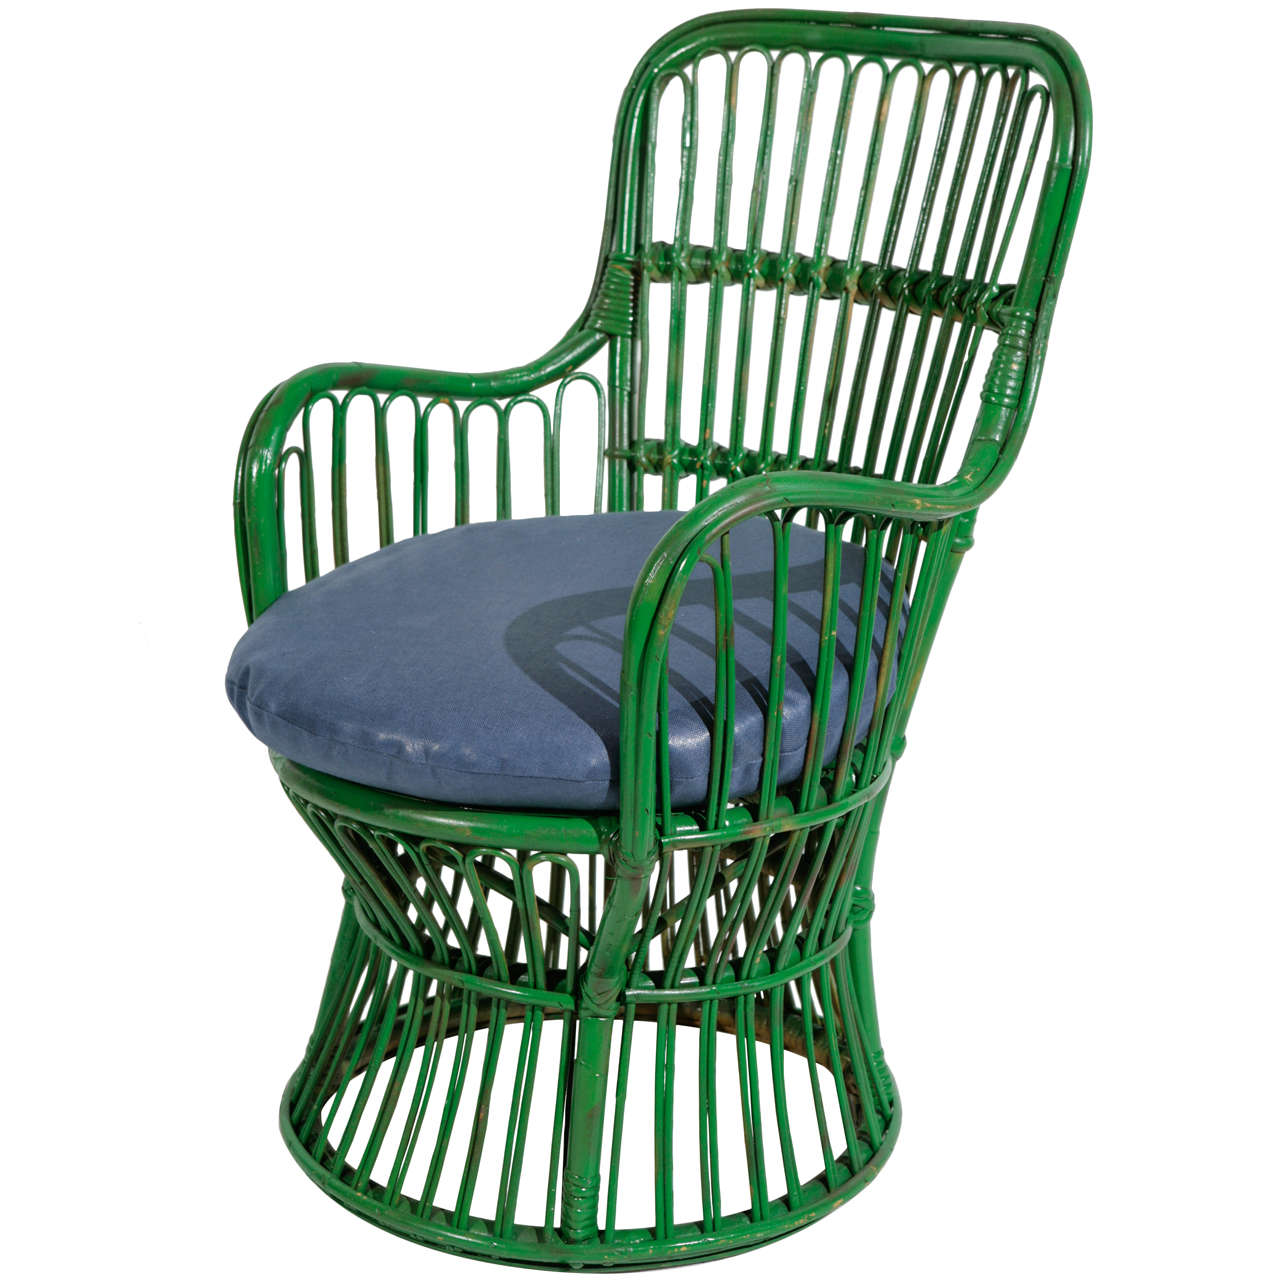 Green Wicker Armchair in the style of Gio Ponti and Lio Carminati | Small